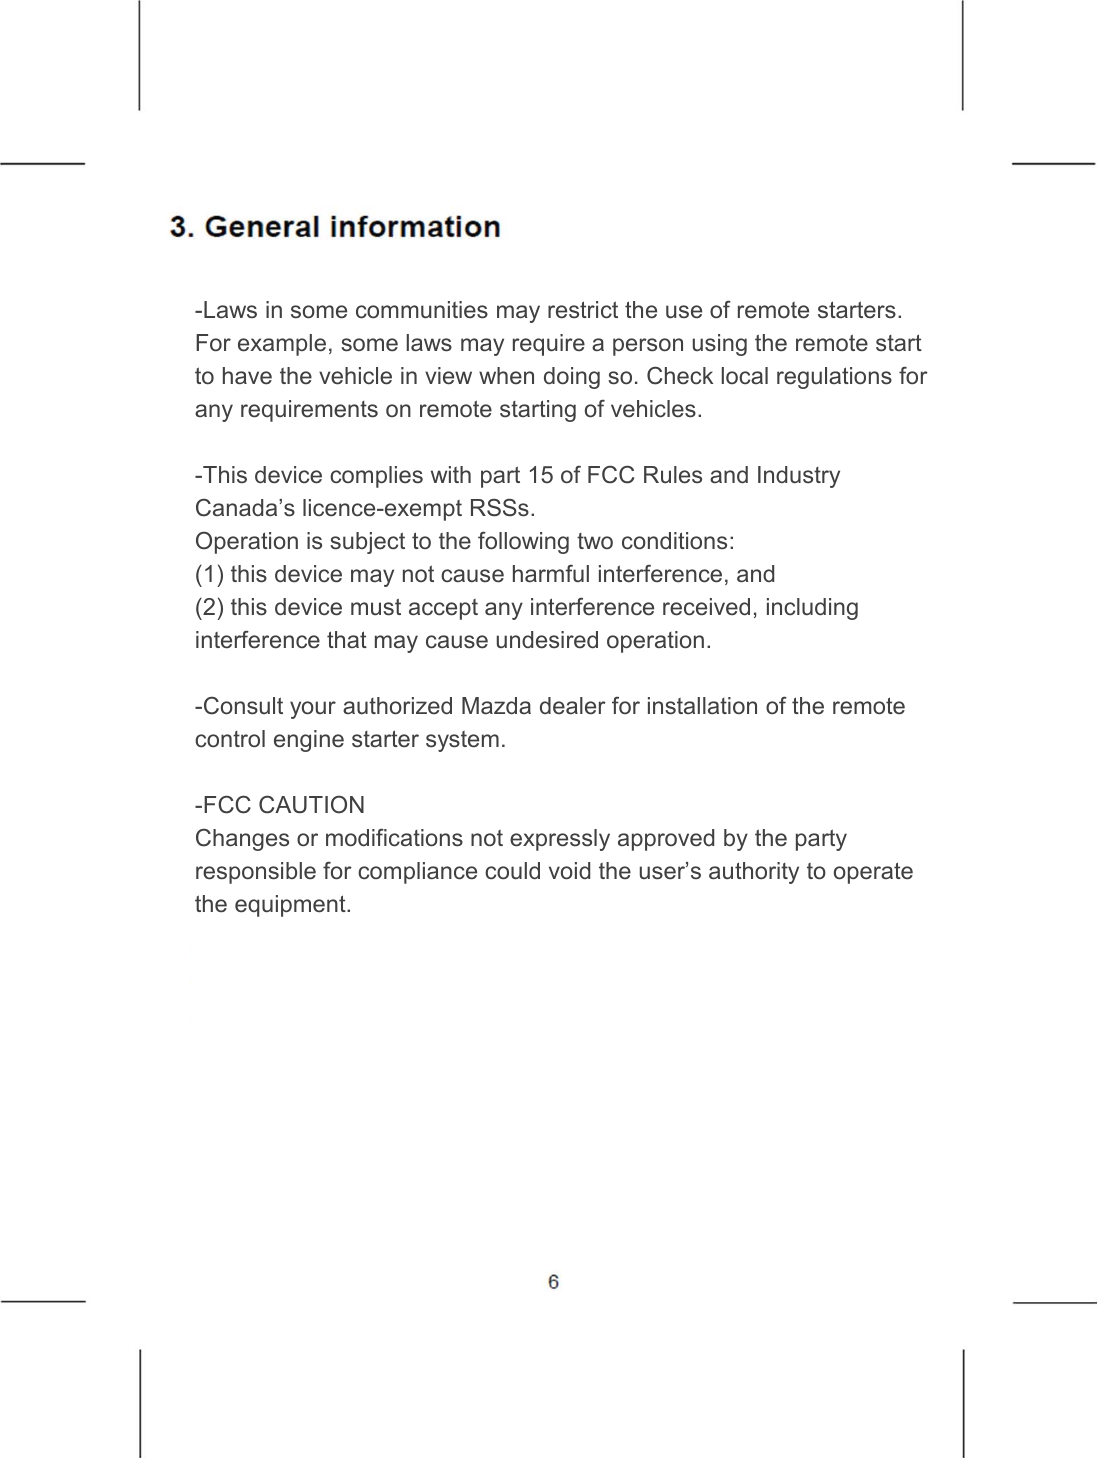 pz170-02021 remote start instructions